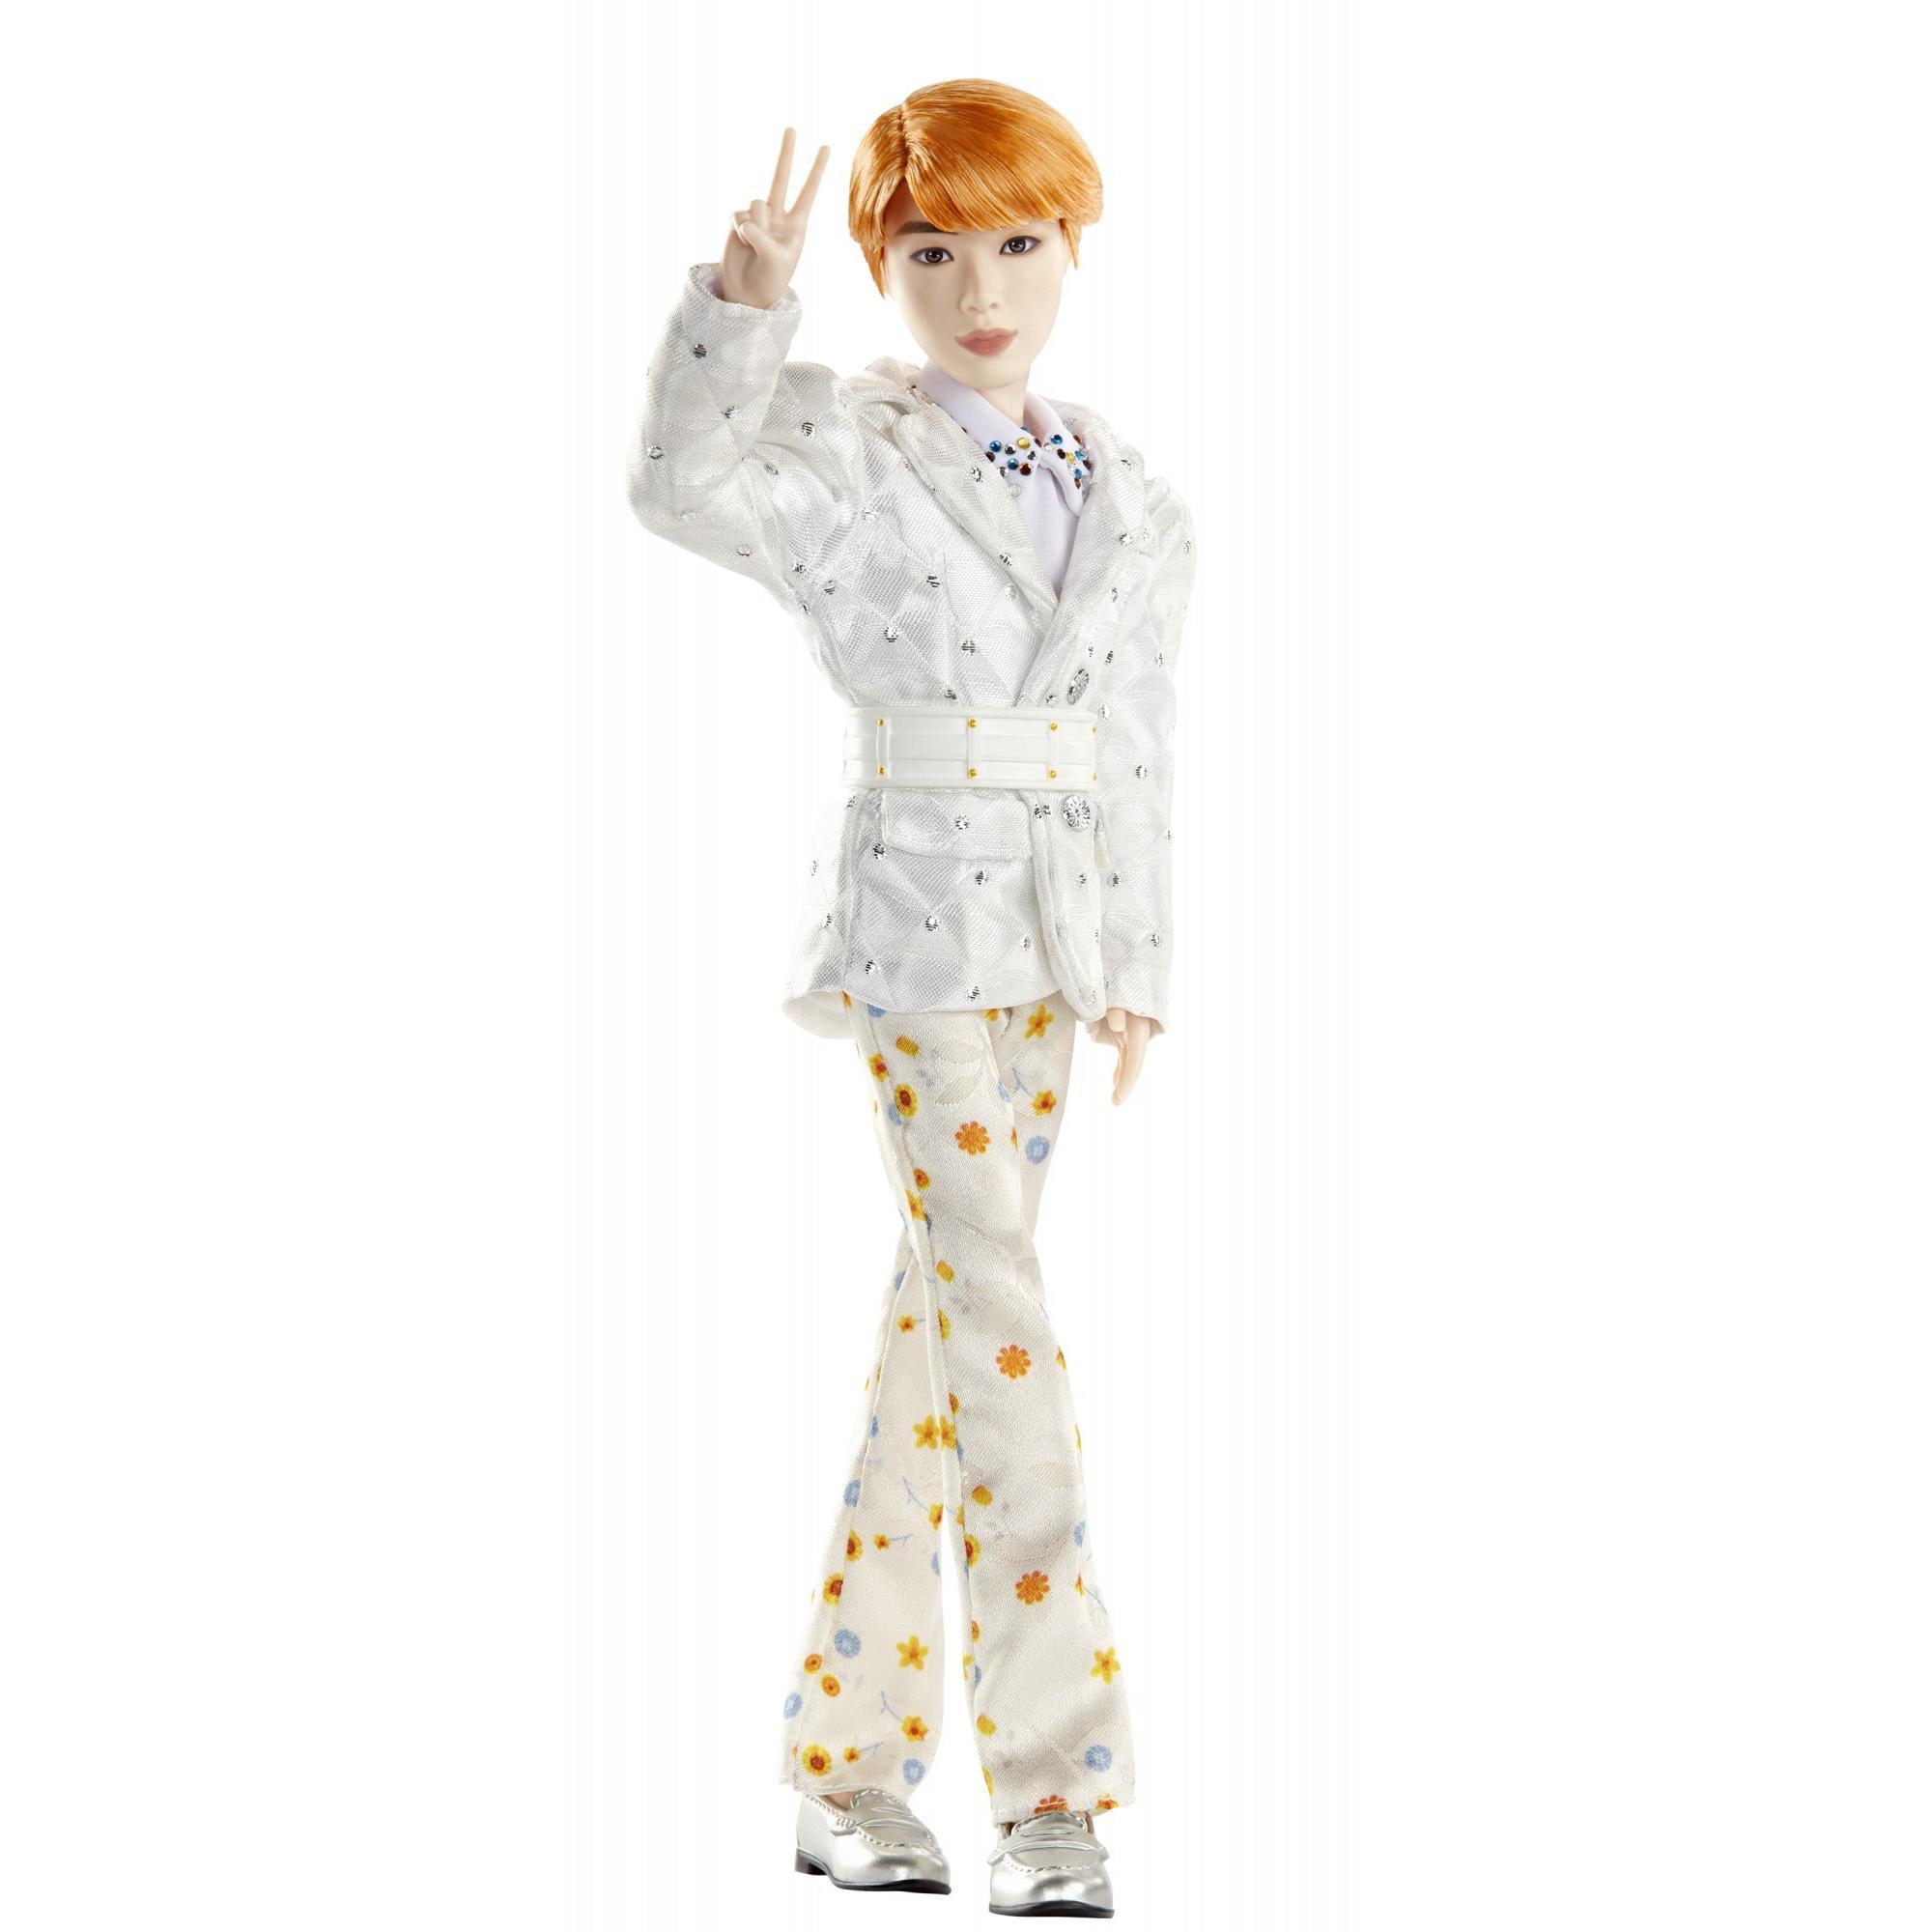 BTS Prestige j-hope Fashion Doll Kid Toy Gift